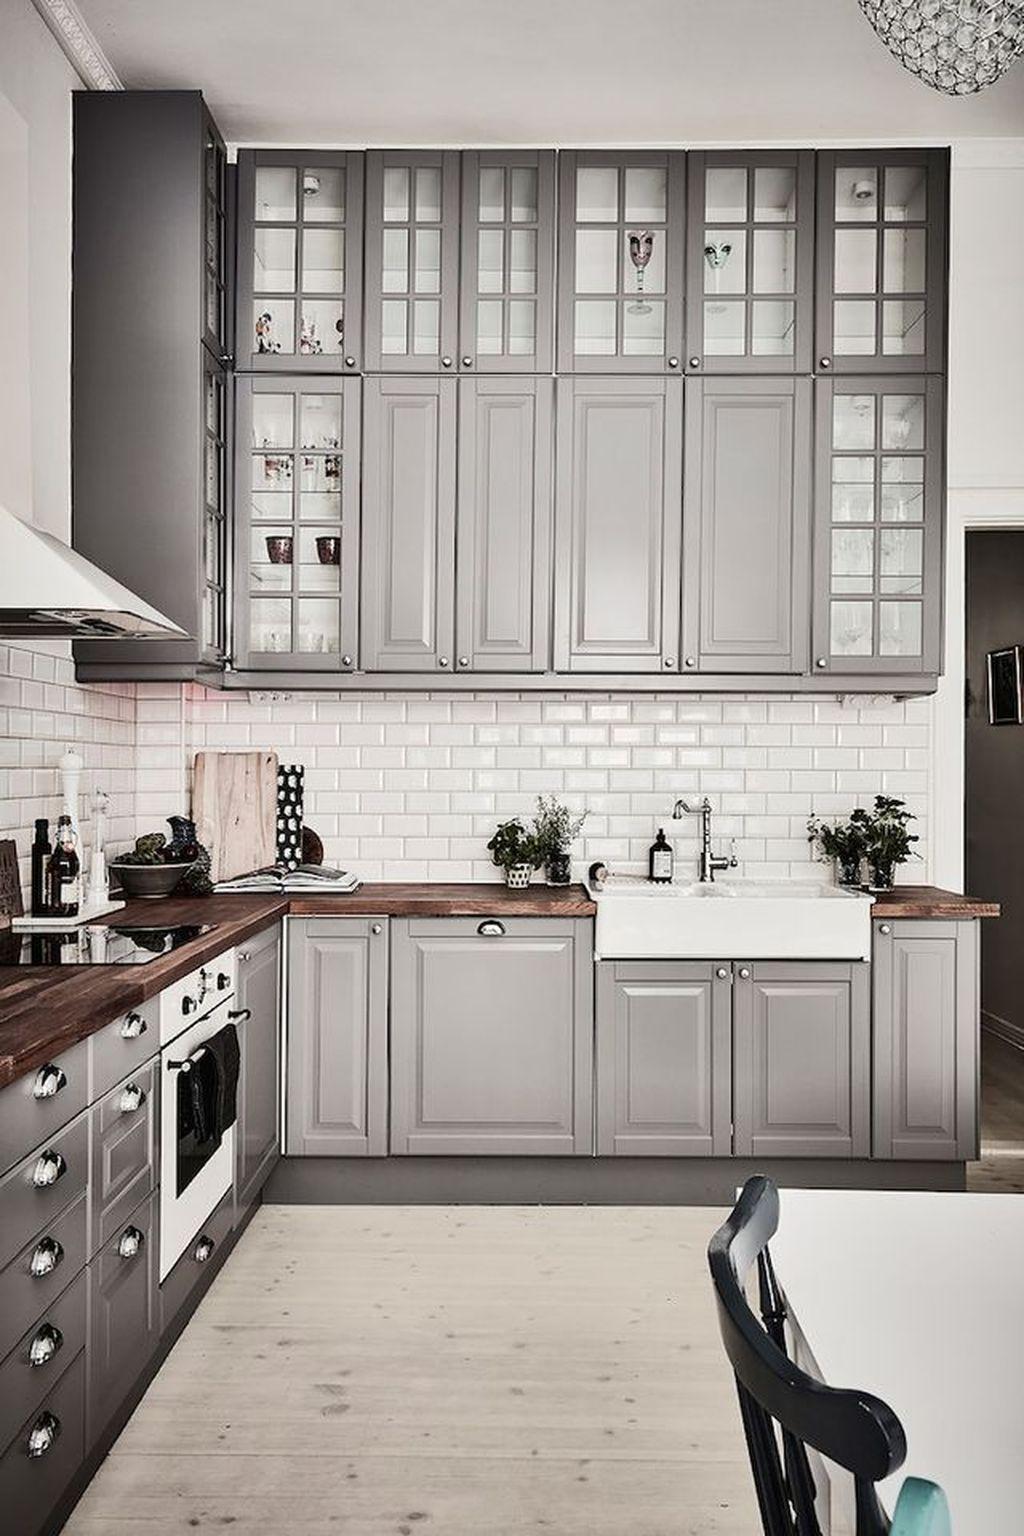 88 Modern Grey And White Kitchen Decoration Ideas  Kitchen Glamorous Black And White Kitchen Designs Decorating Inspiration